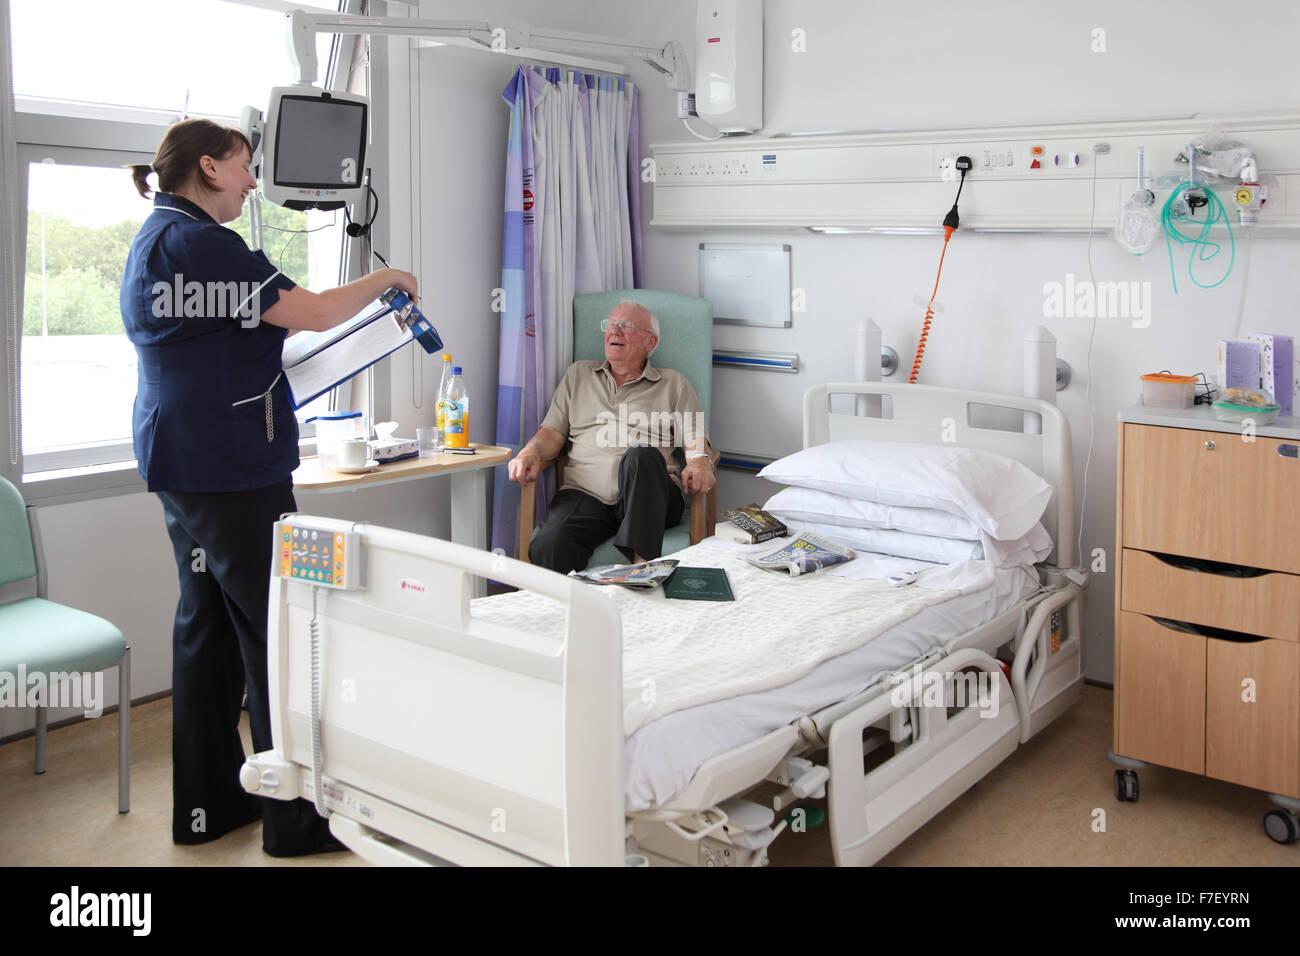 Hospital Ward Stock Photos & Hospital Ward Stock Images ...